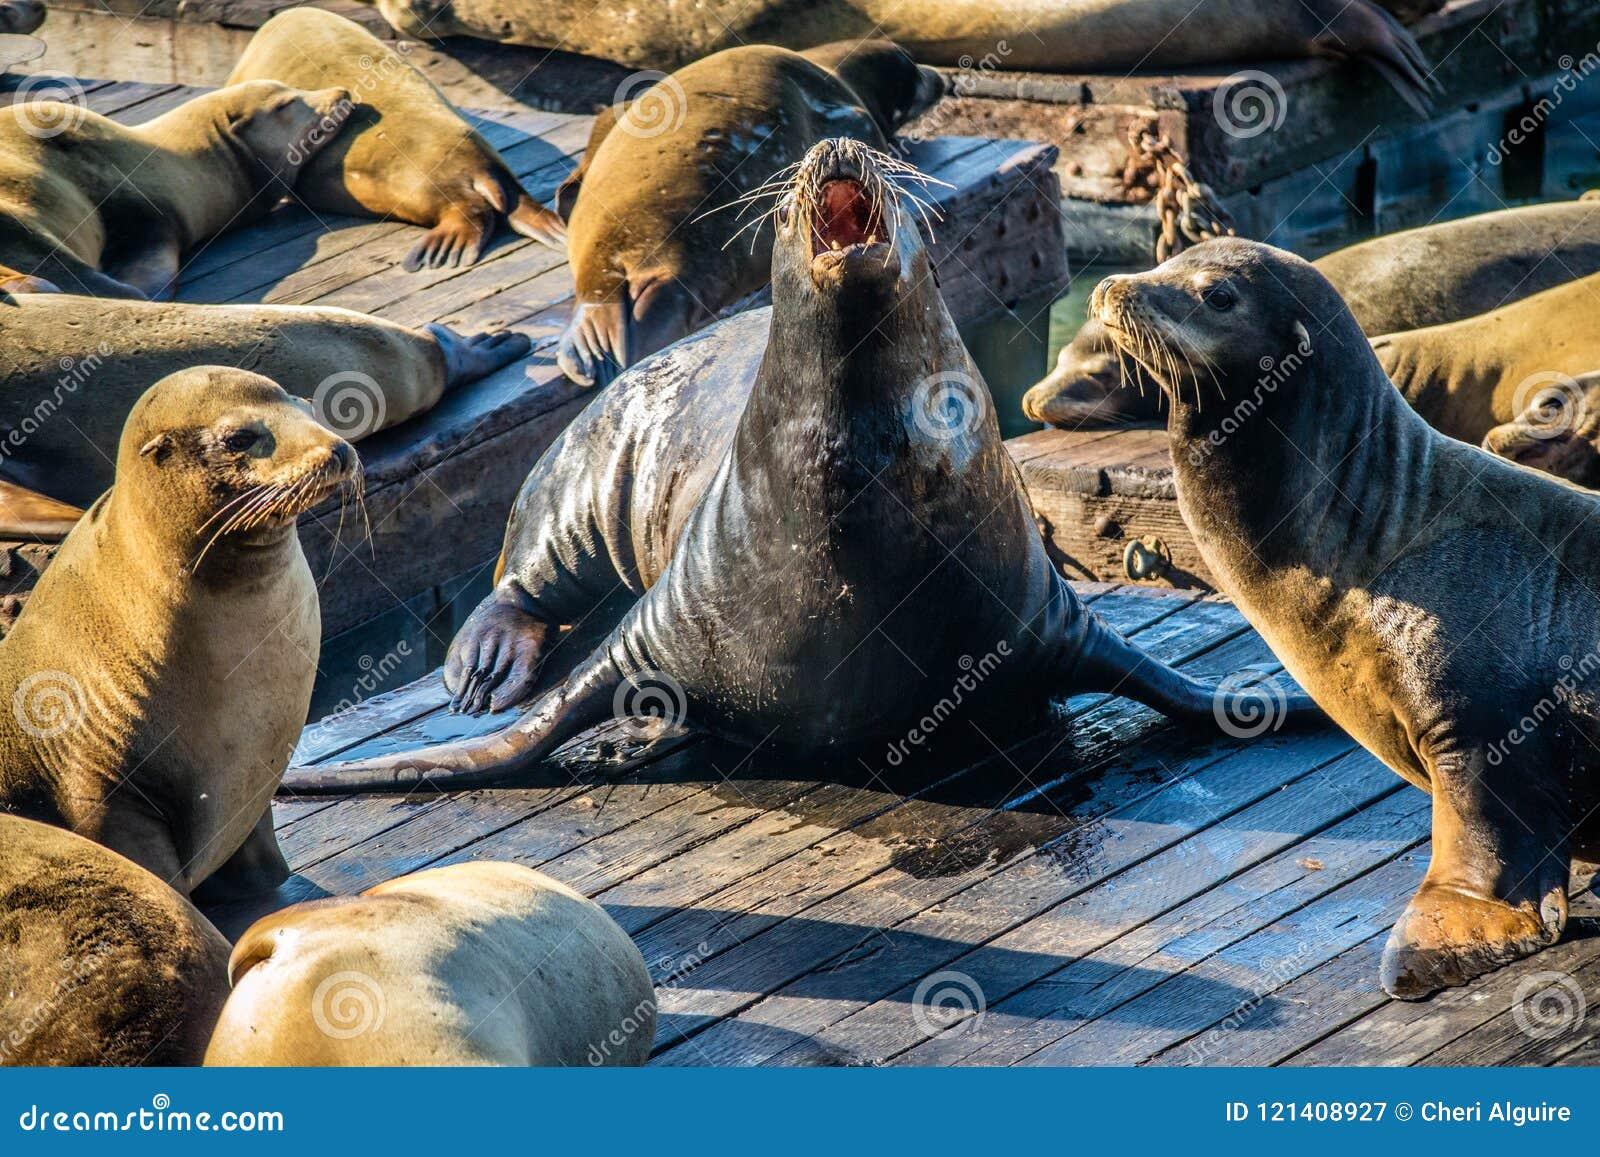 California Sea Lion in San Francisco, California